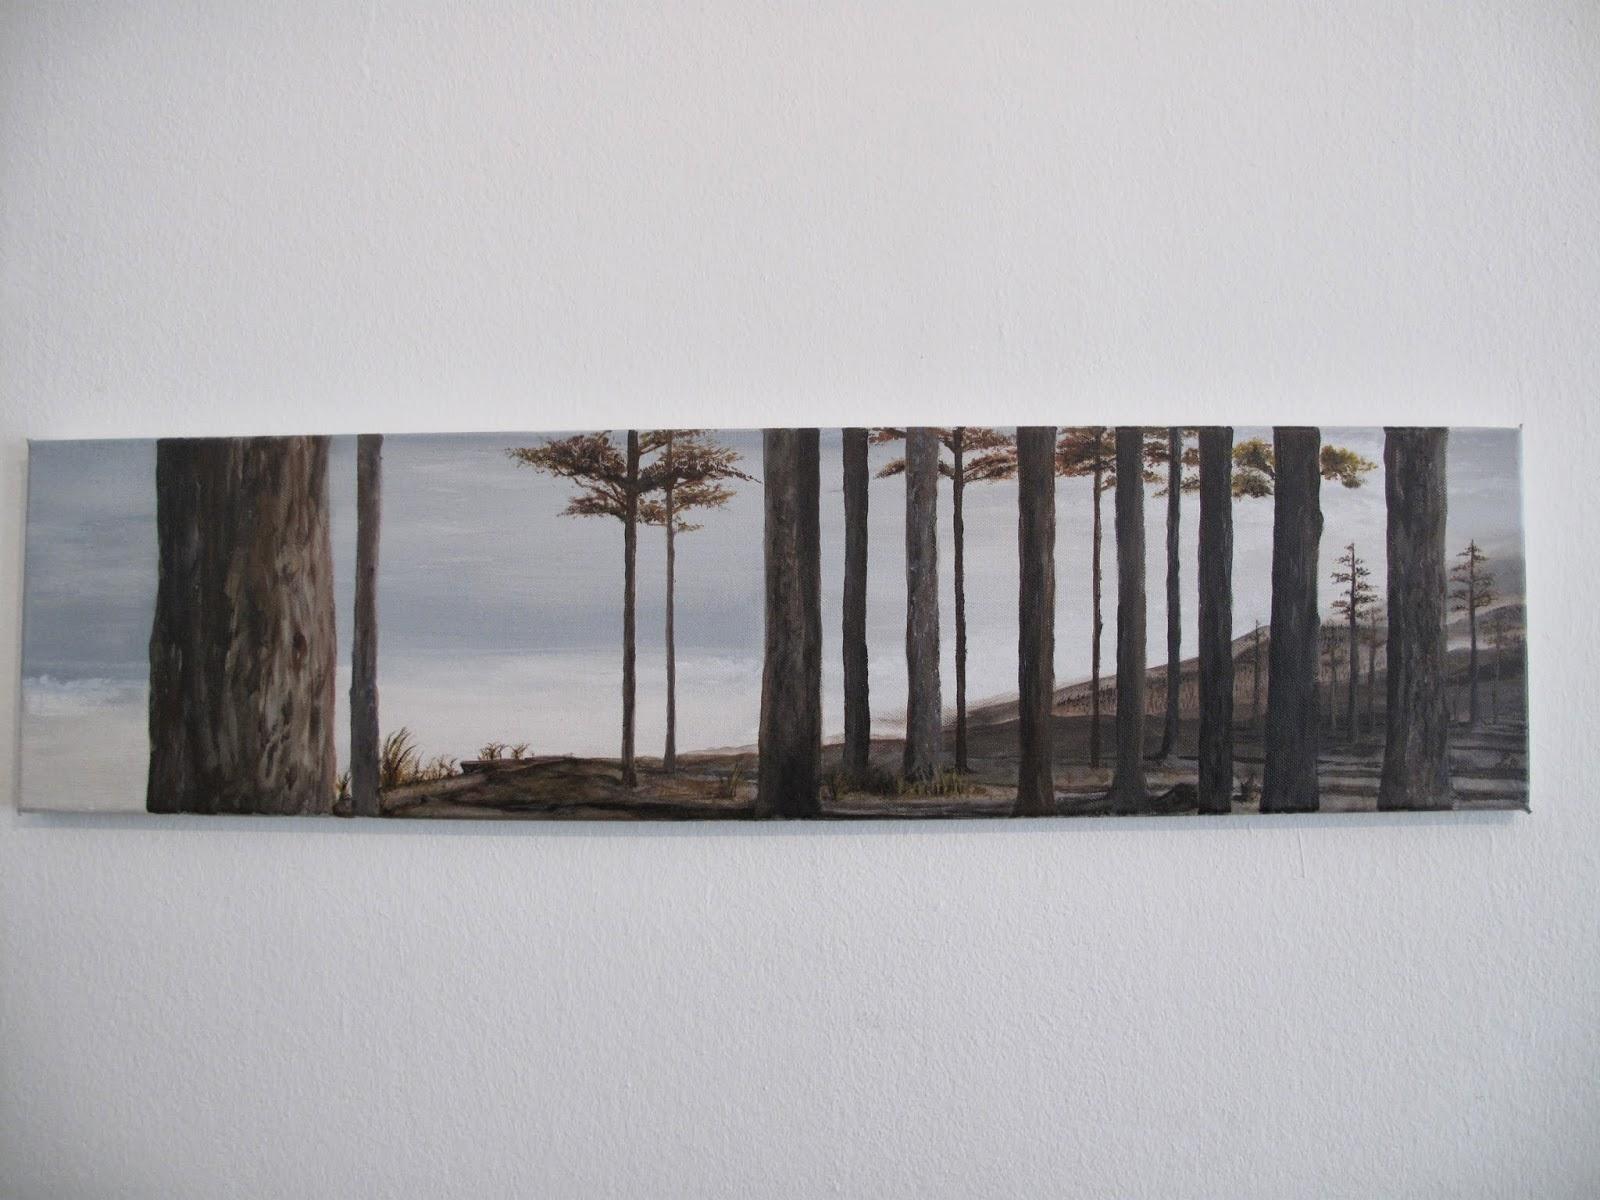 Ruhende Natur. 20x80. Acryl auf Leinwand. Januar 2014